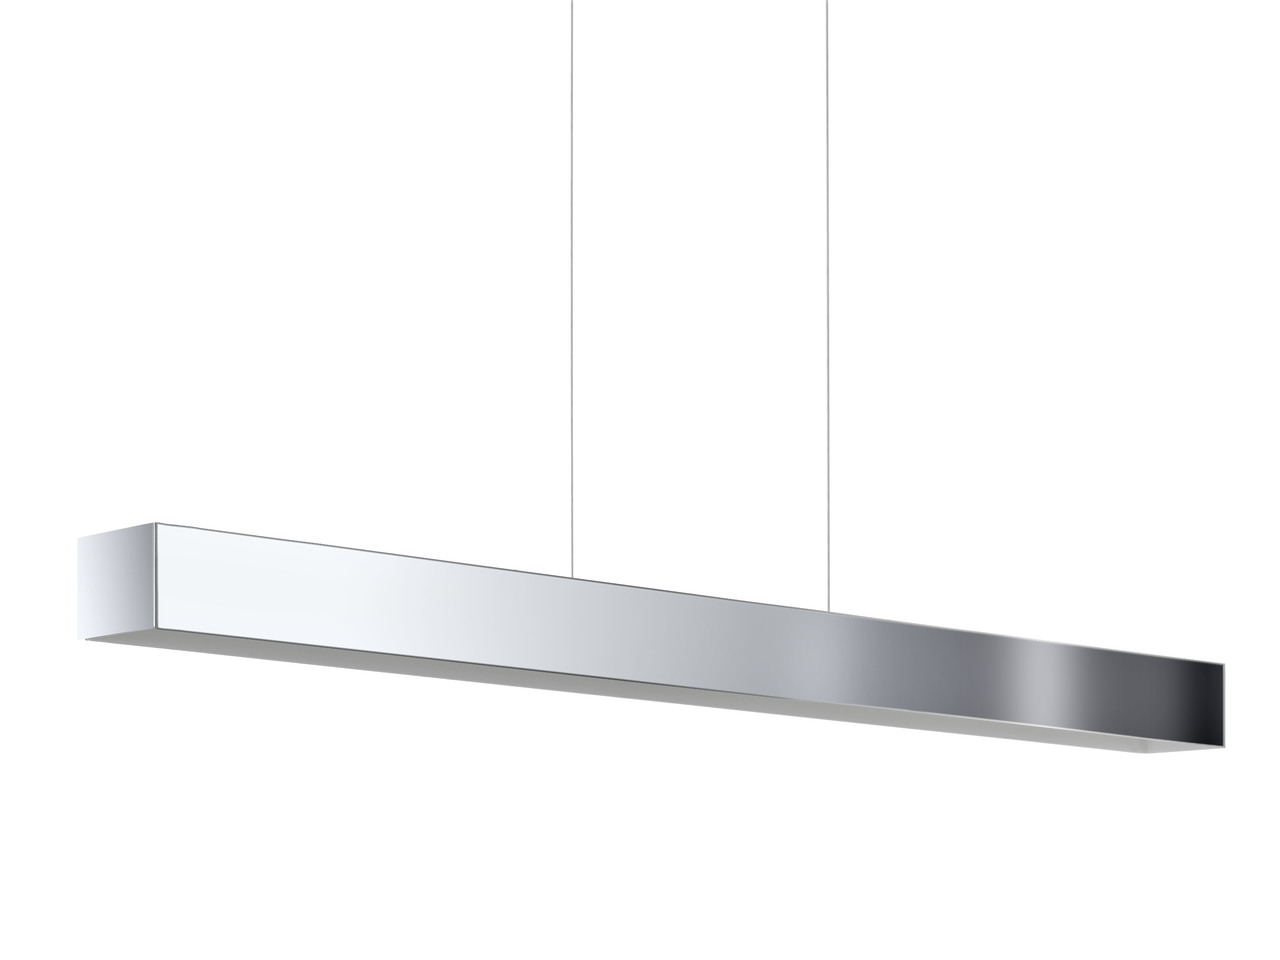 EGLO LED Pendelleuchte Collada, Metallisch, Metall, 93348